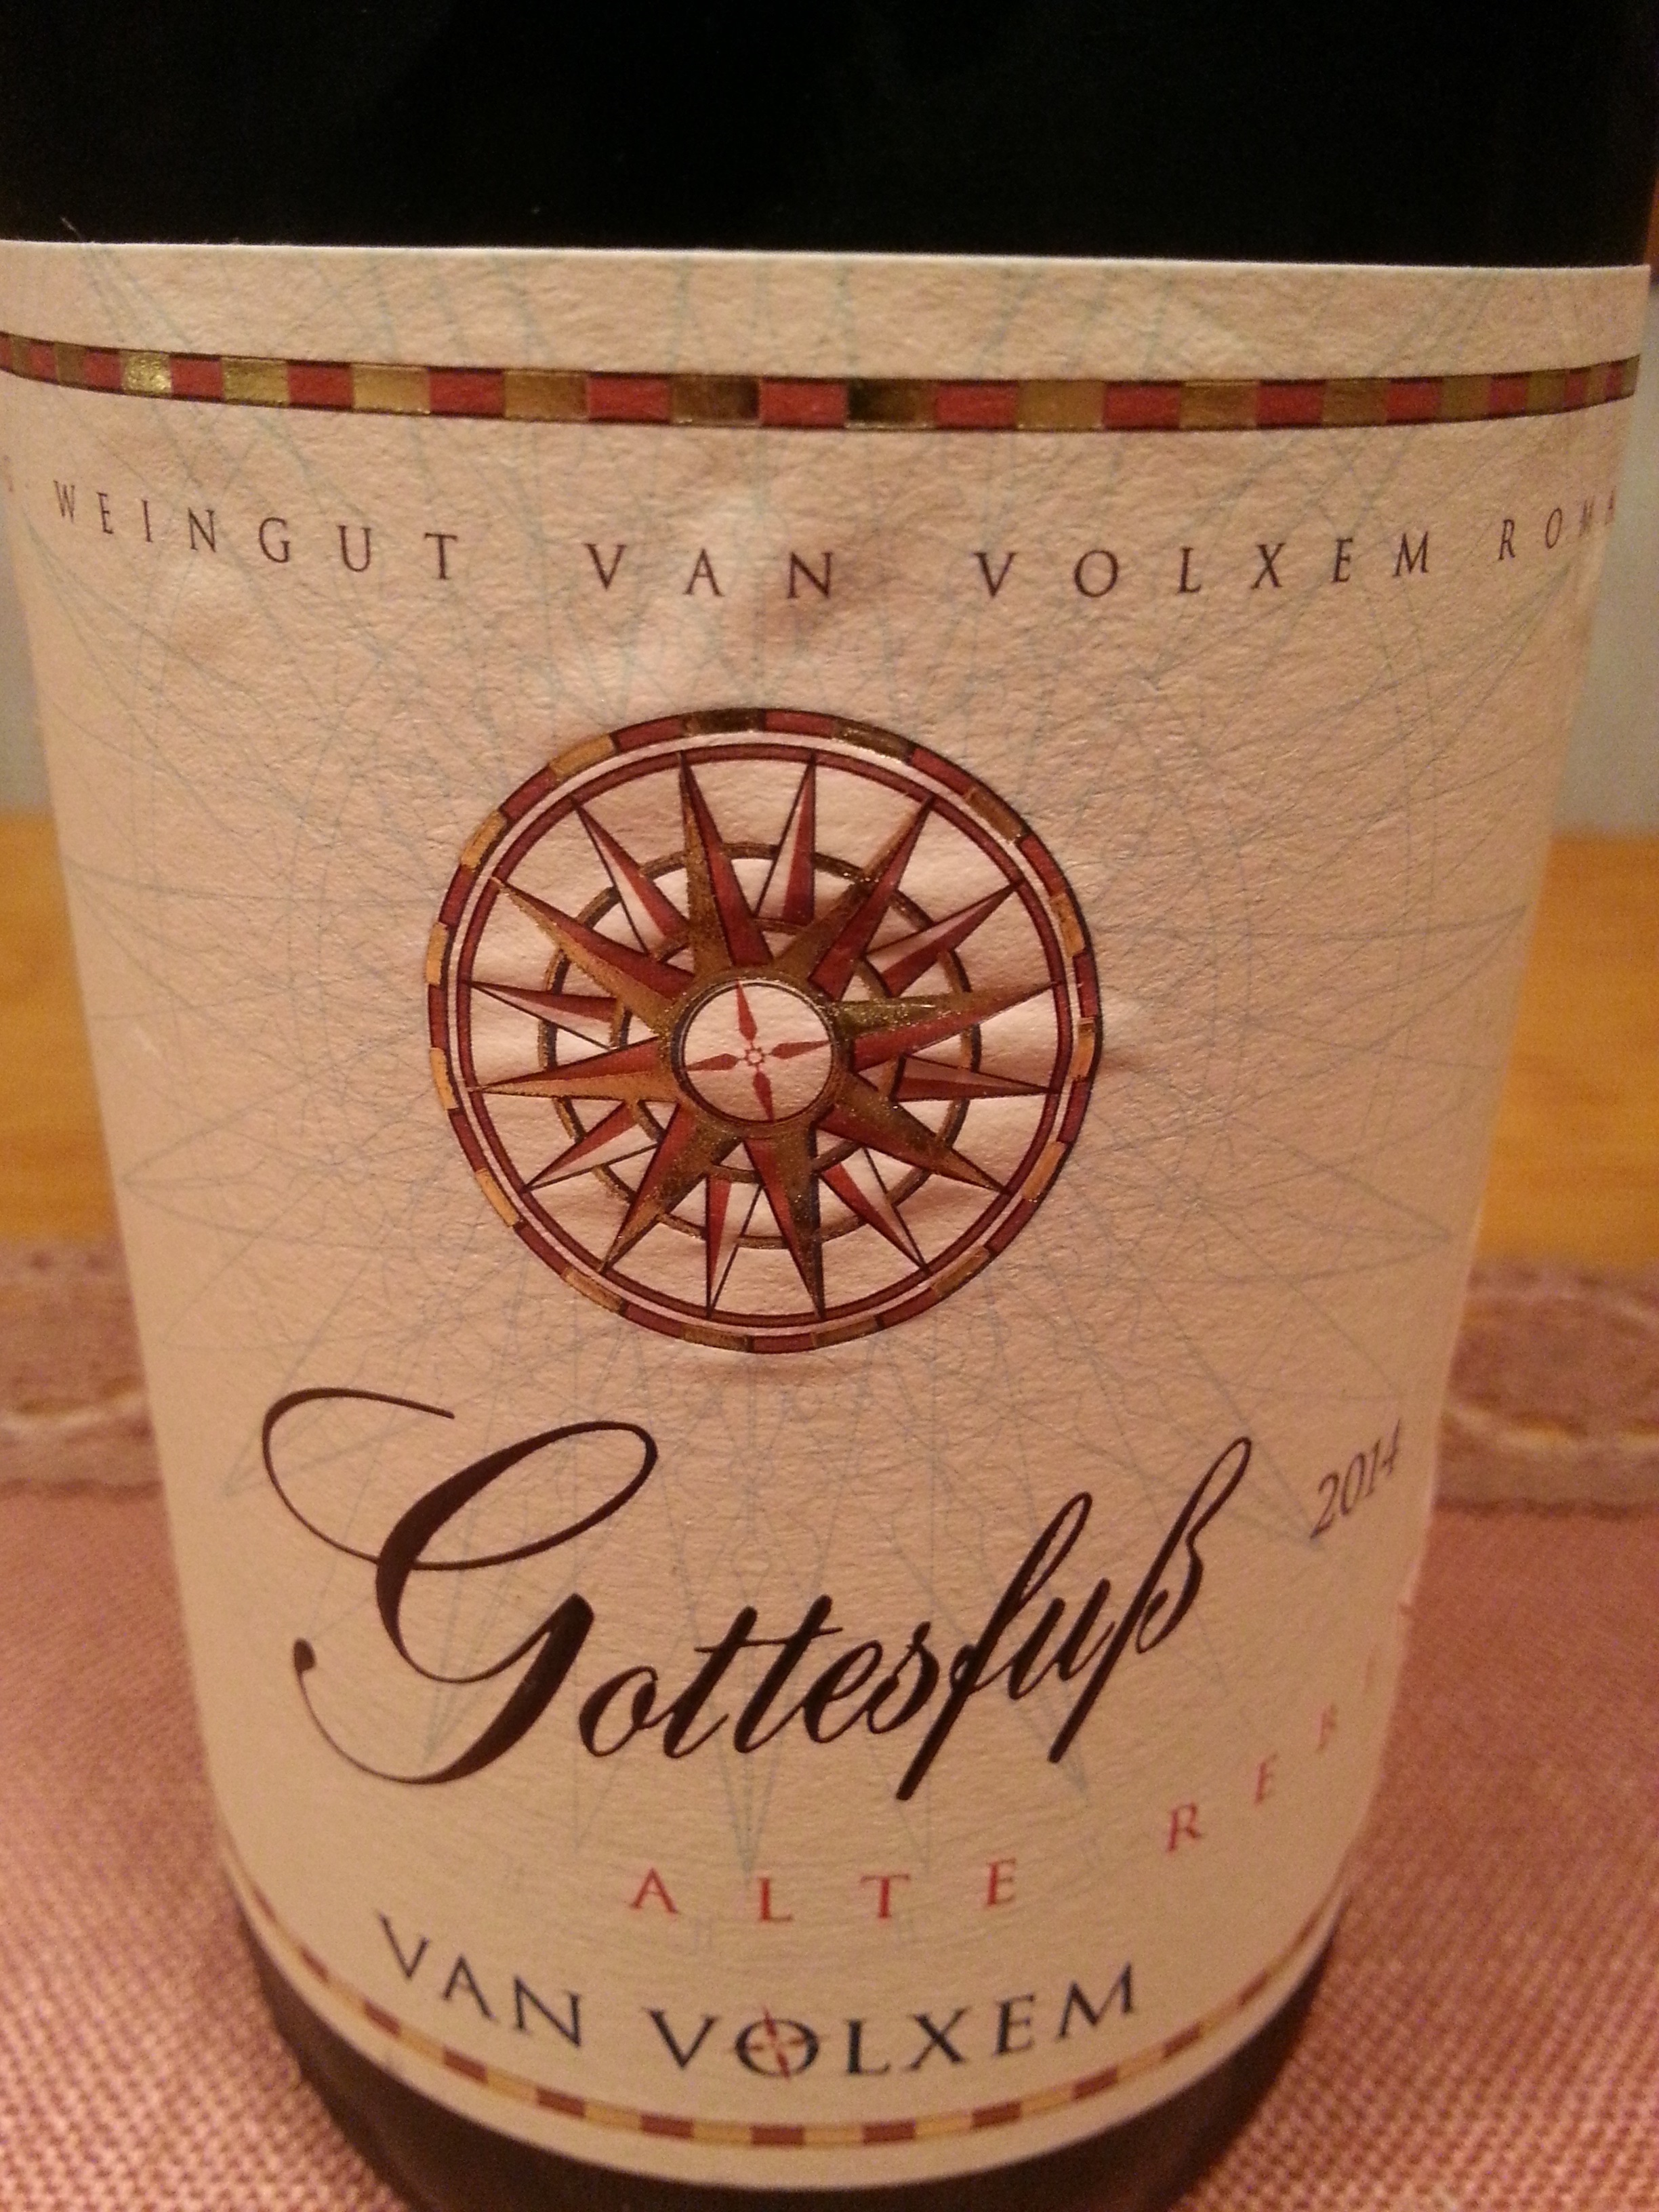 2014 Riesling Alte Reben Gottesfuß GG   Van Volxem